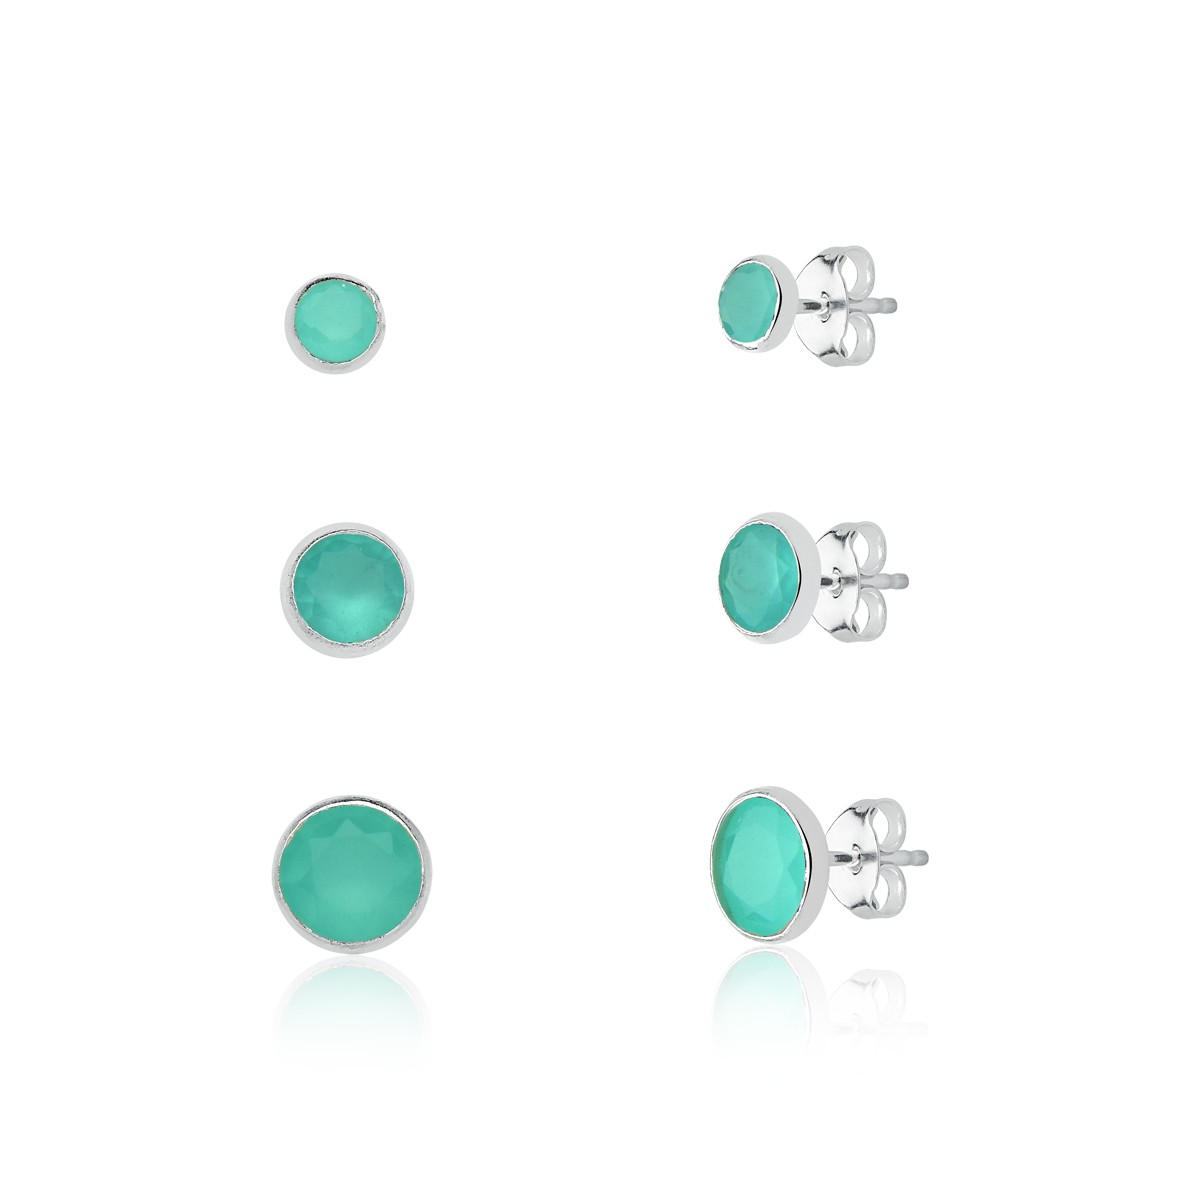 Brinco Kit Cristal Verde